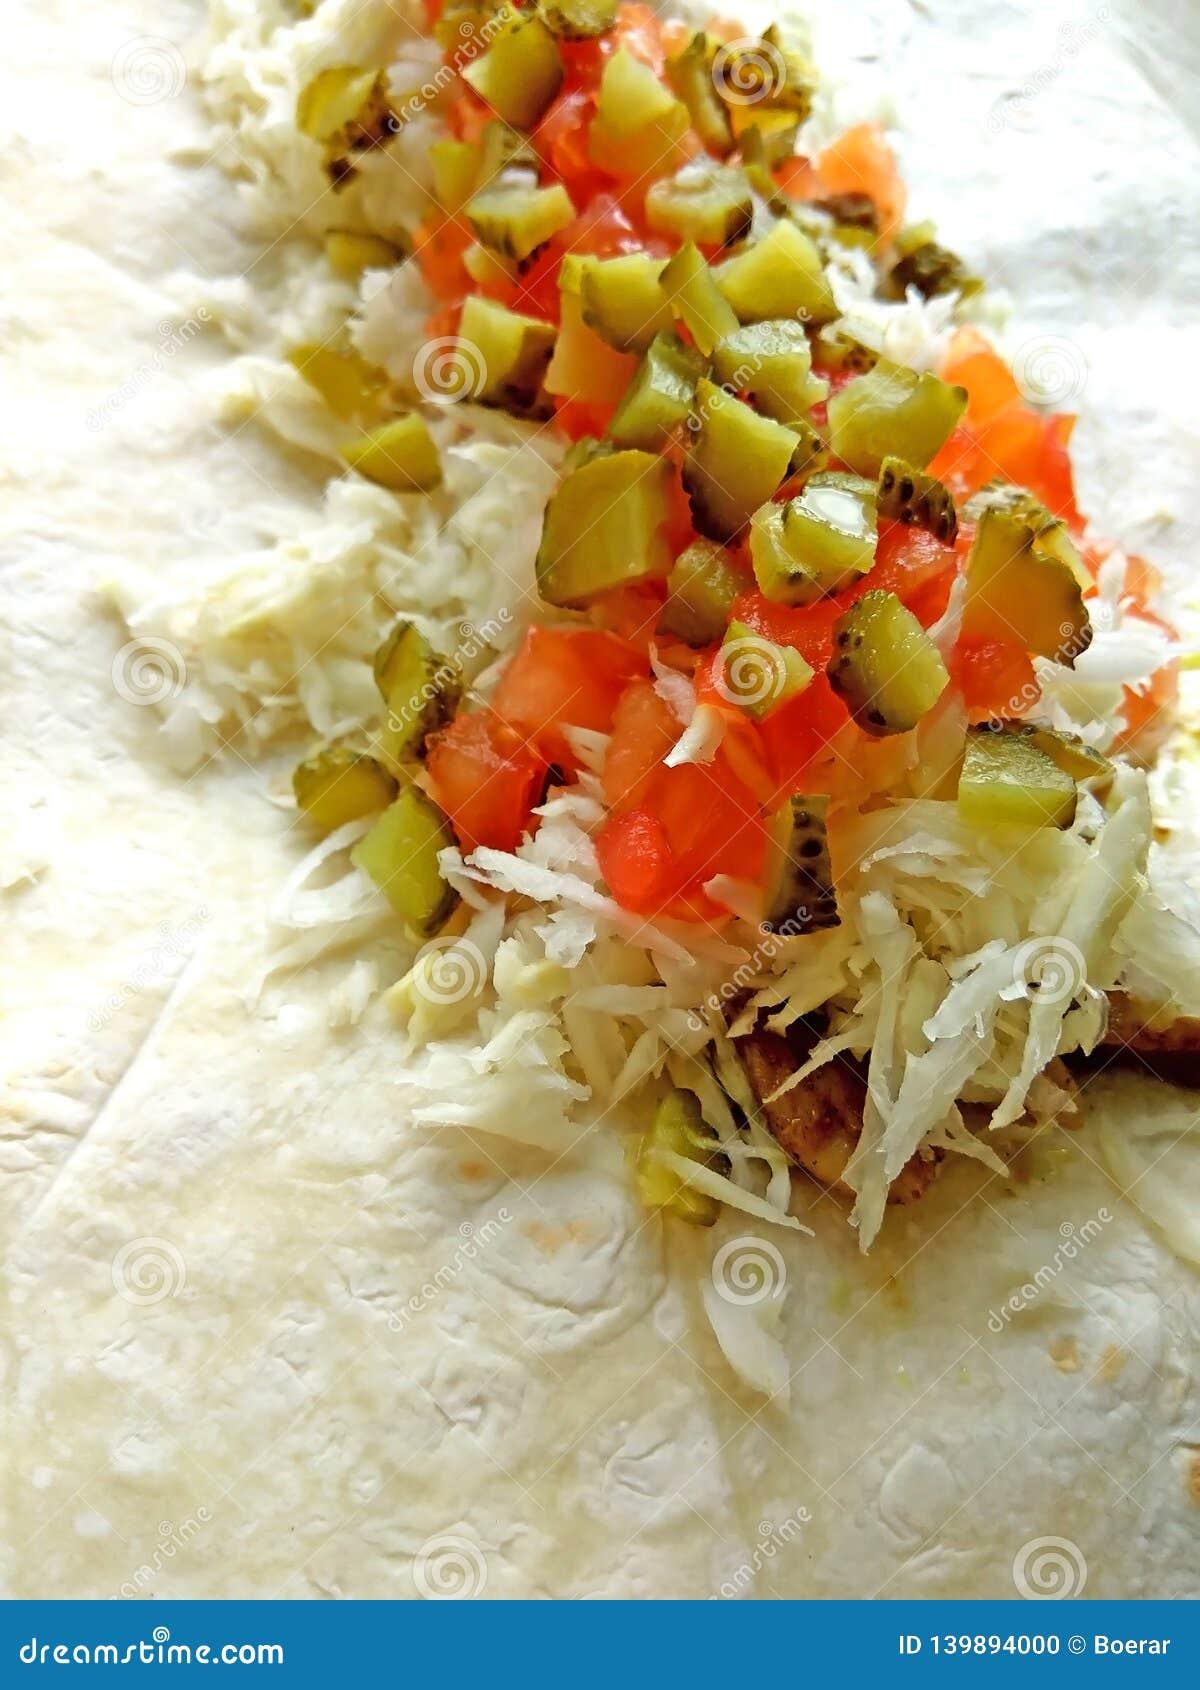 Lavash με την πλήρωση σαλάτας κοτόπουλου, λάχανων, ντοματών και τουρσιών